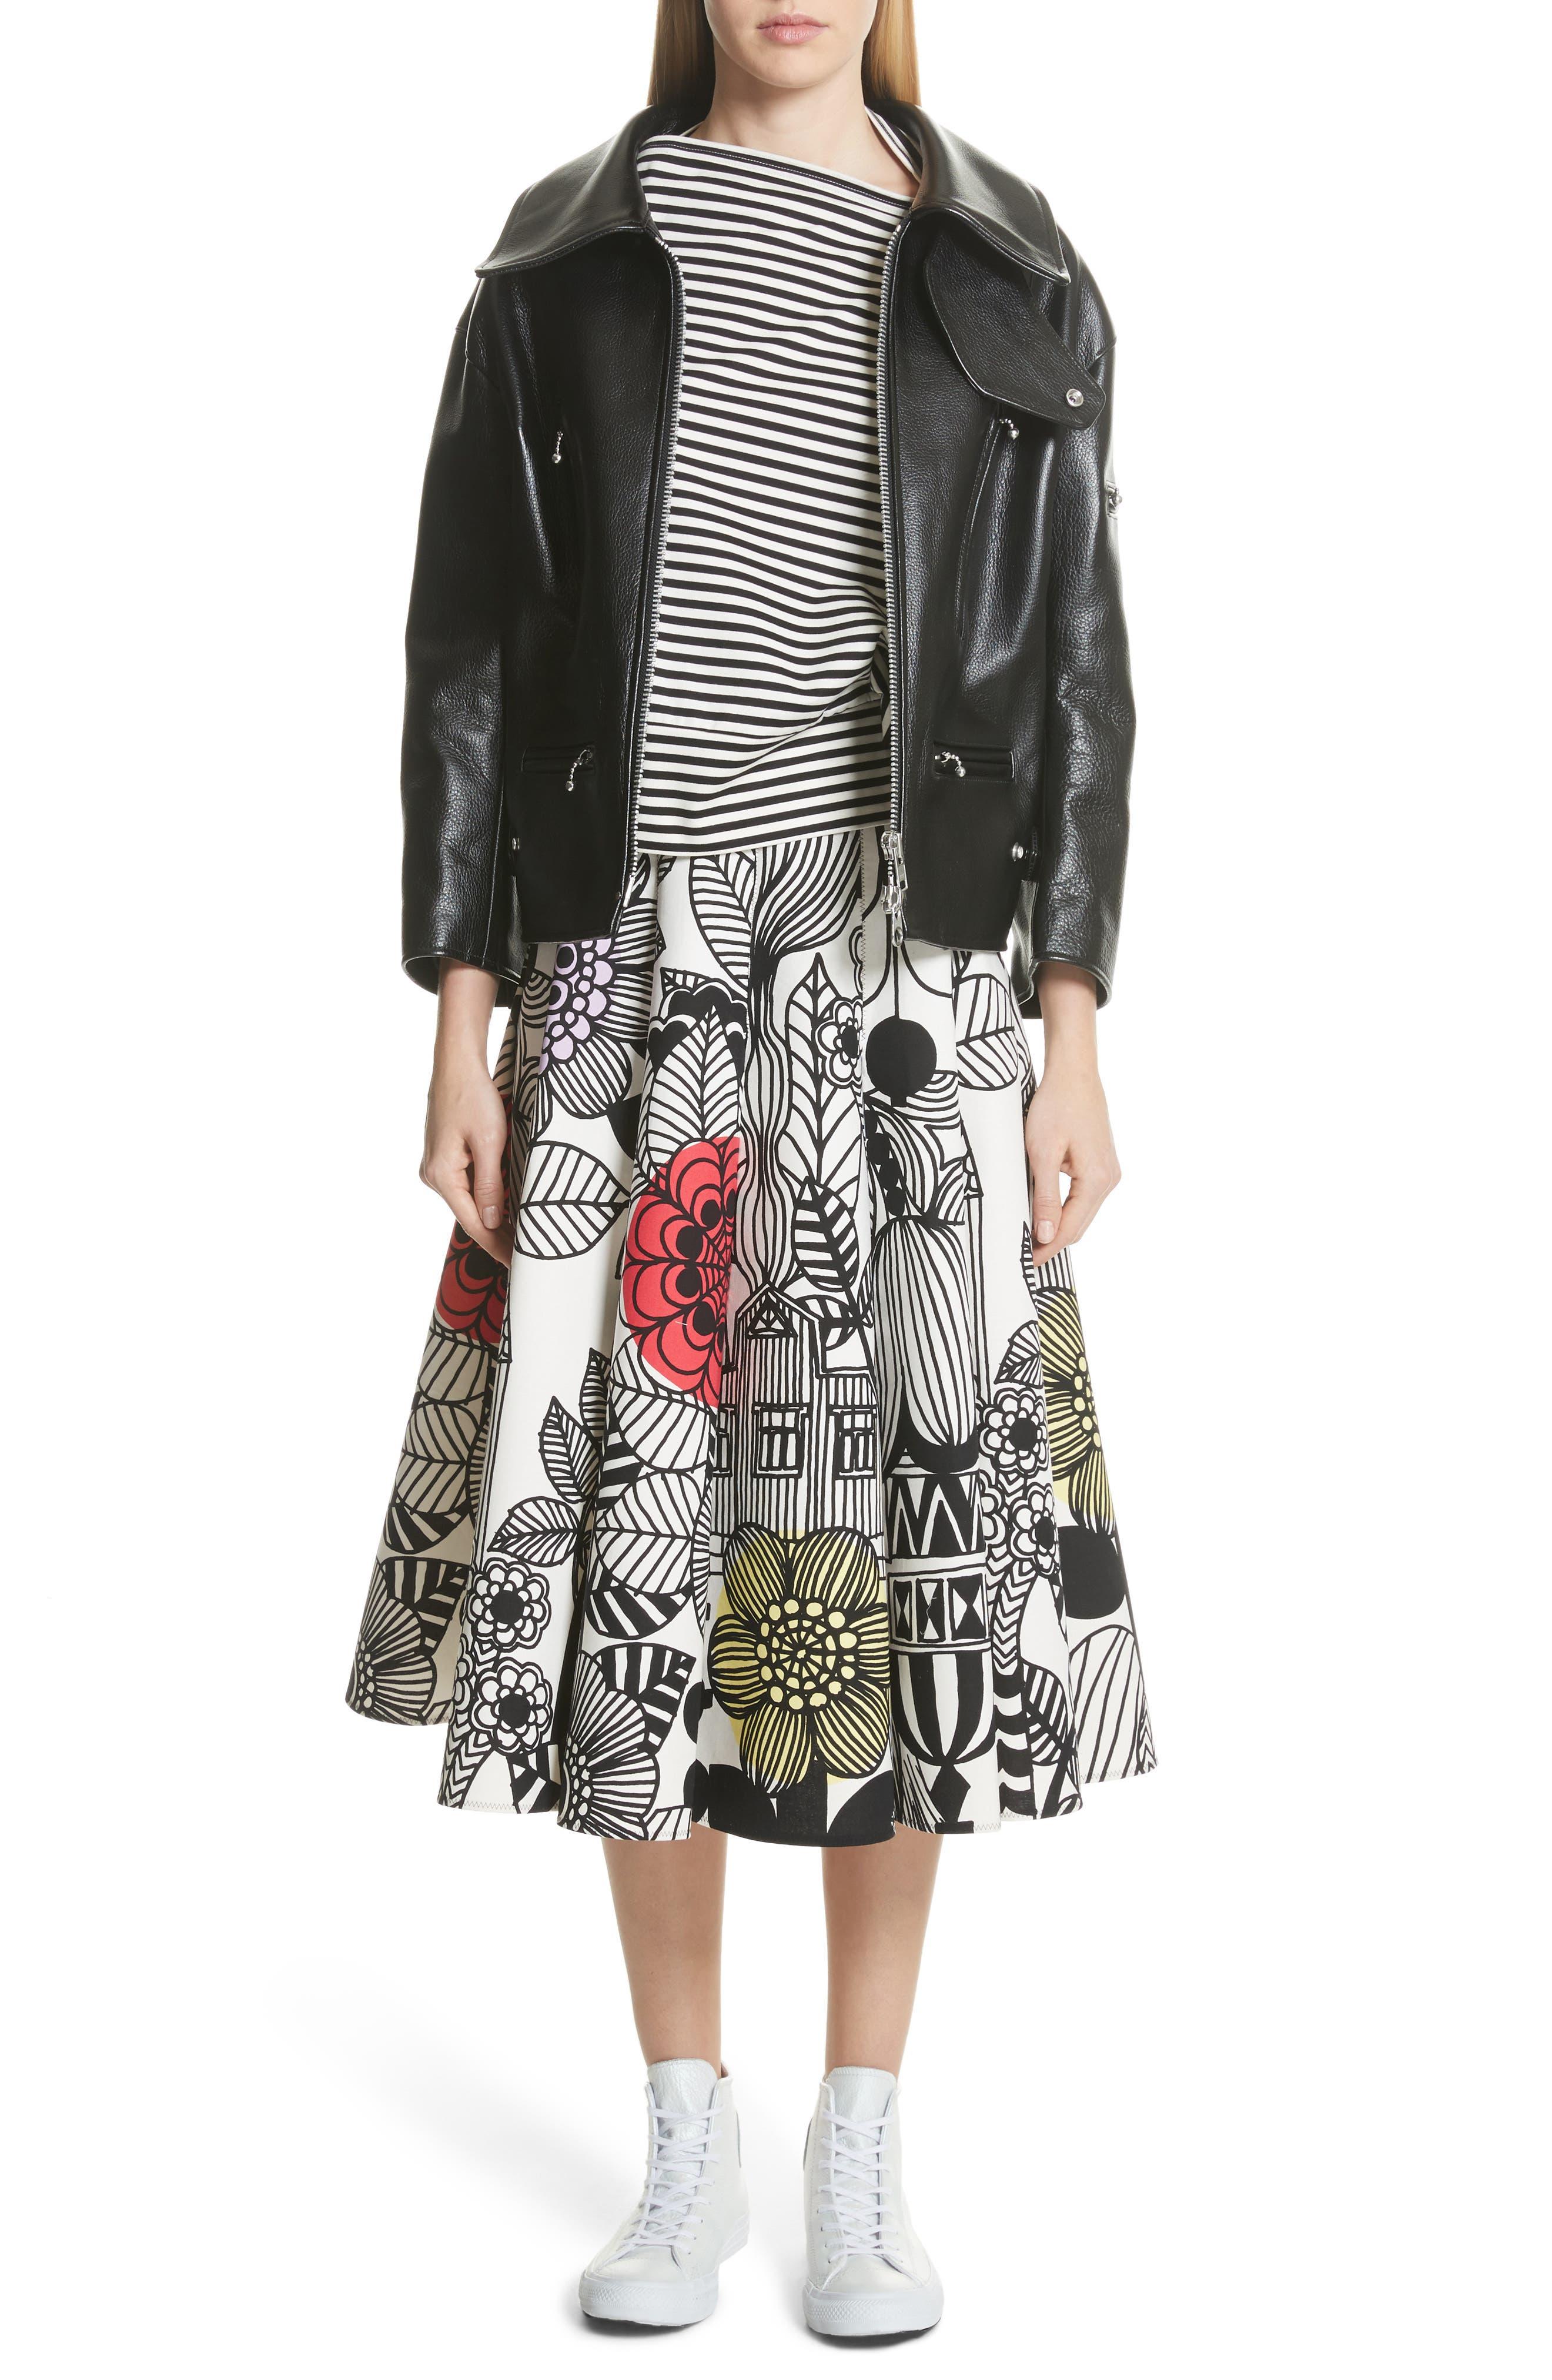 x Marimekko Vegetable Print Cotton Skirt,                             Alternate thumbnail 7, color,                             Wht/ Blk/ Ylw